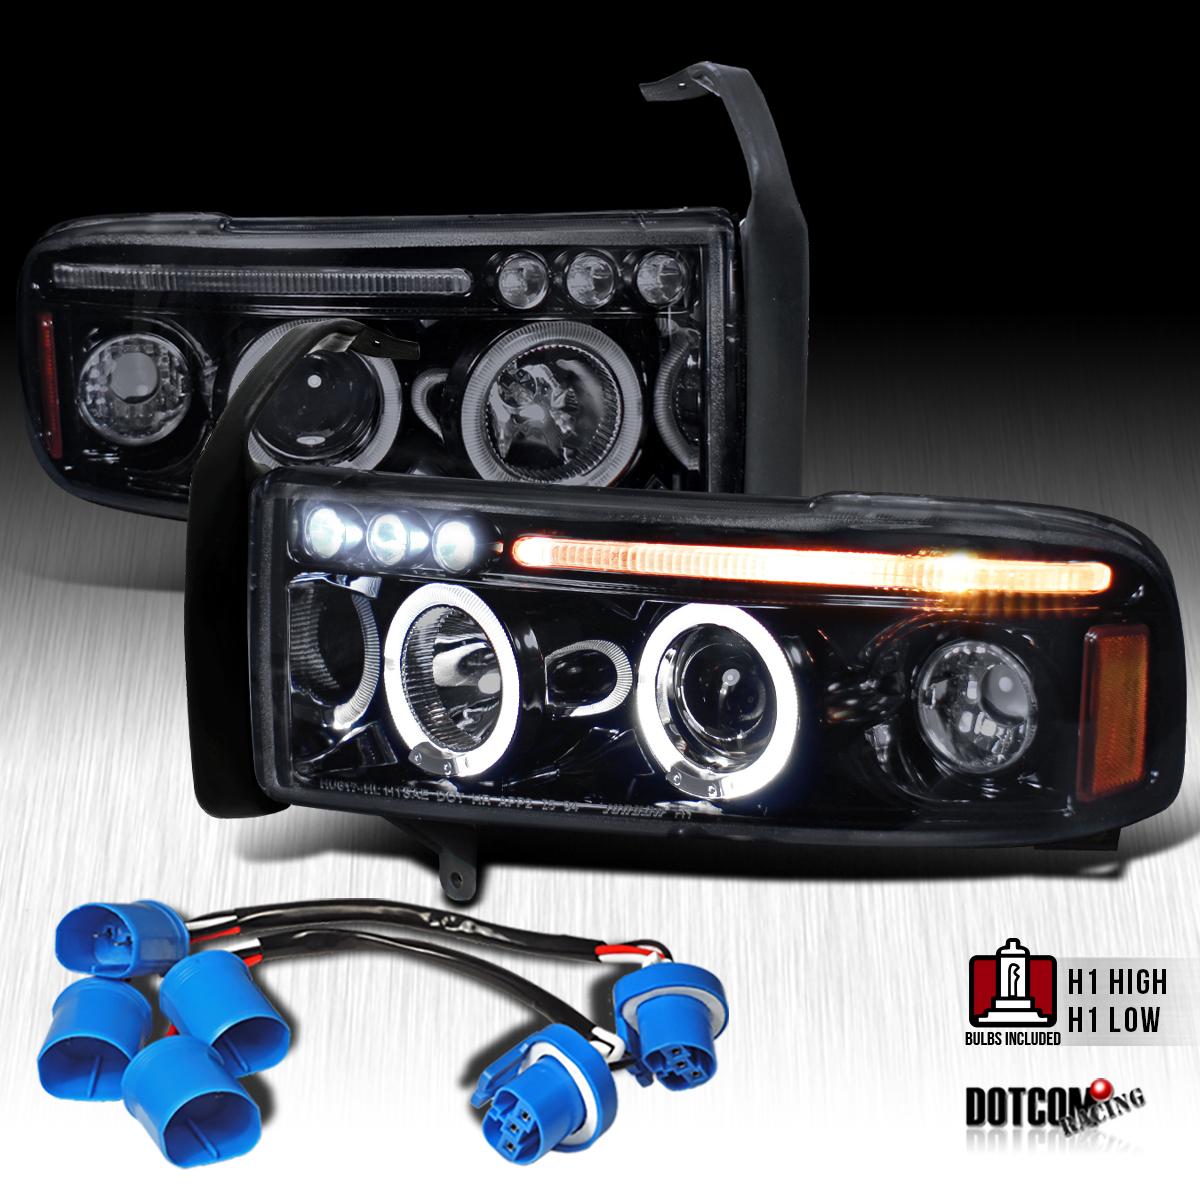 2001 dodge ram 1500 steering column wiring diagram 2001 headlights for 2001 dodge ram 1500 amazing 2017 top cars gallery on 2001 dodge ram 1500